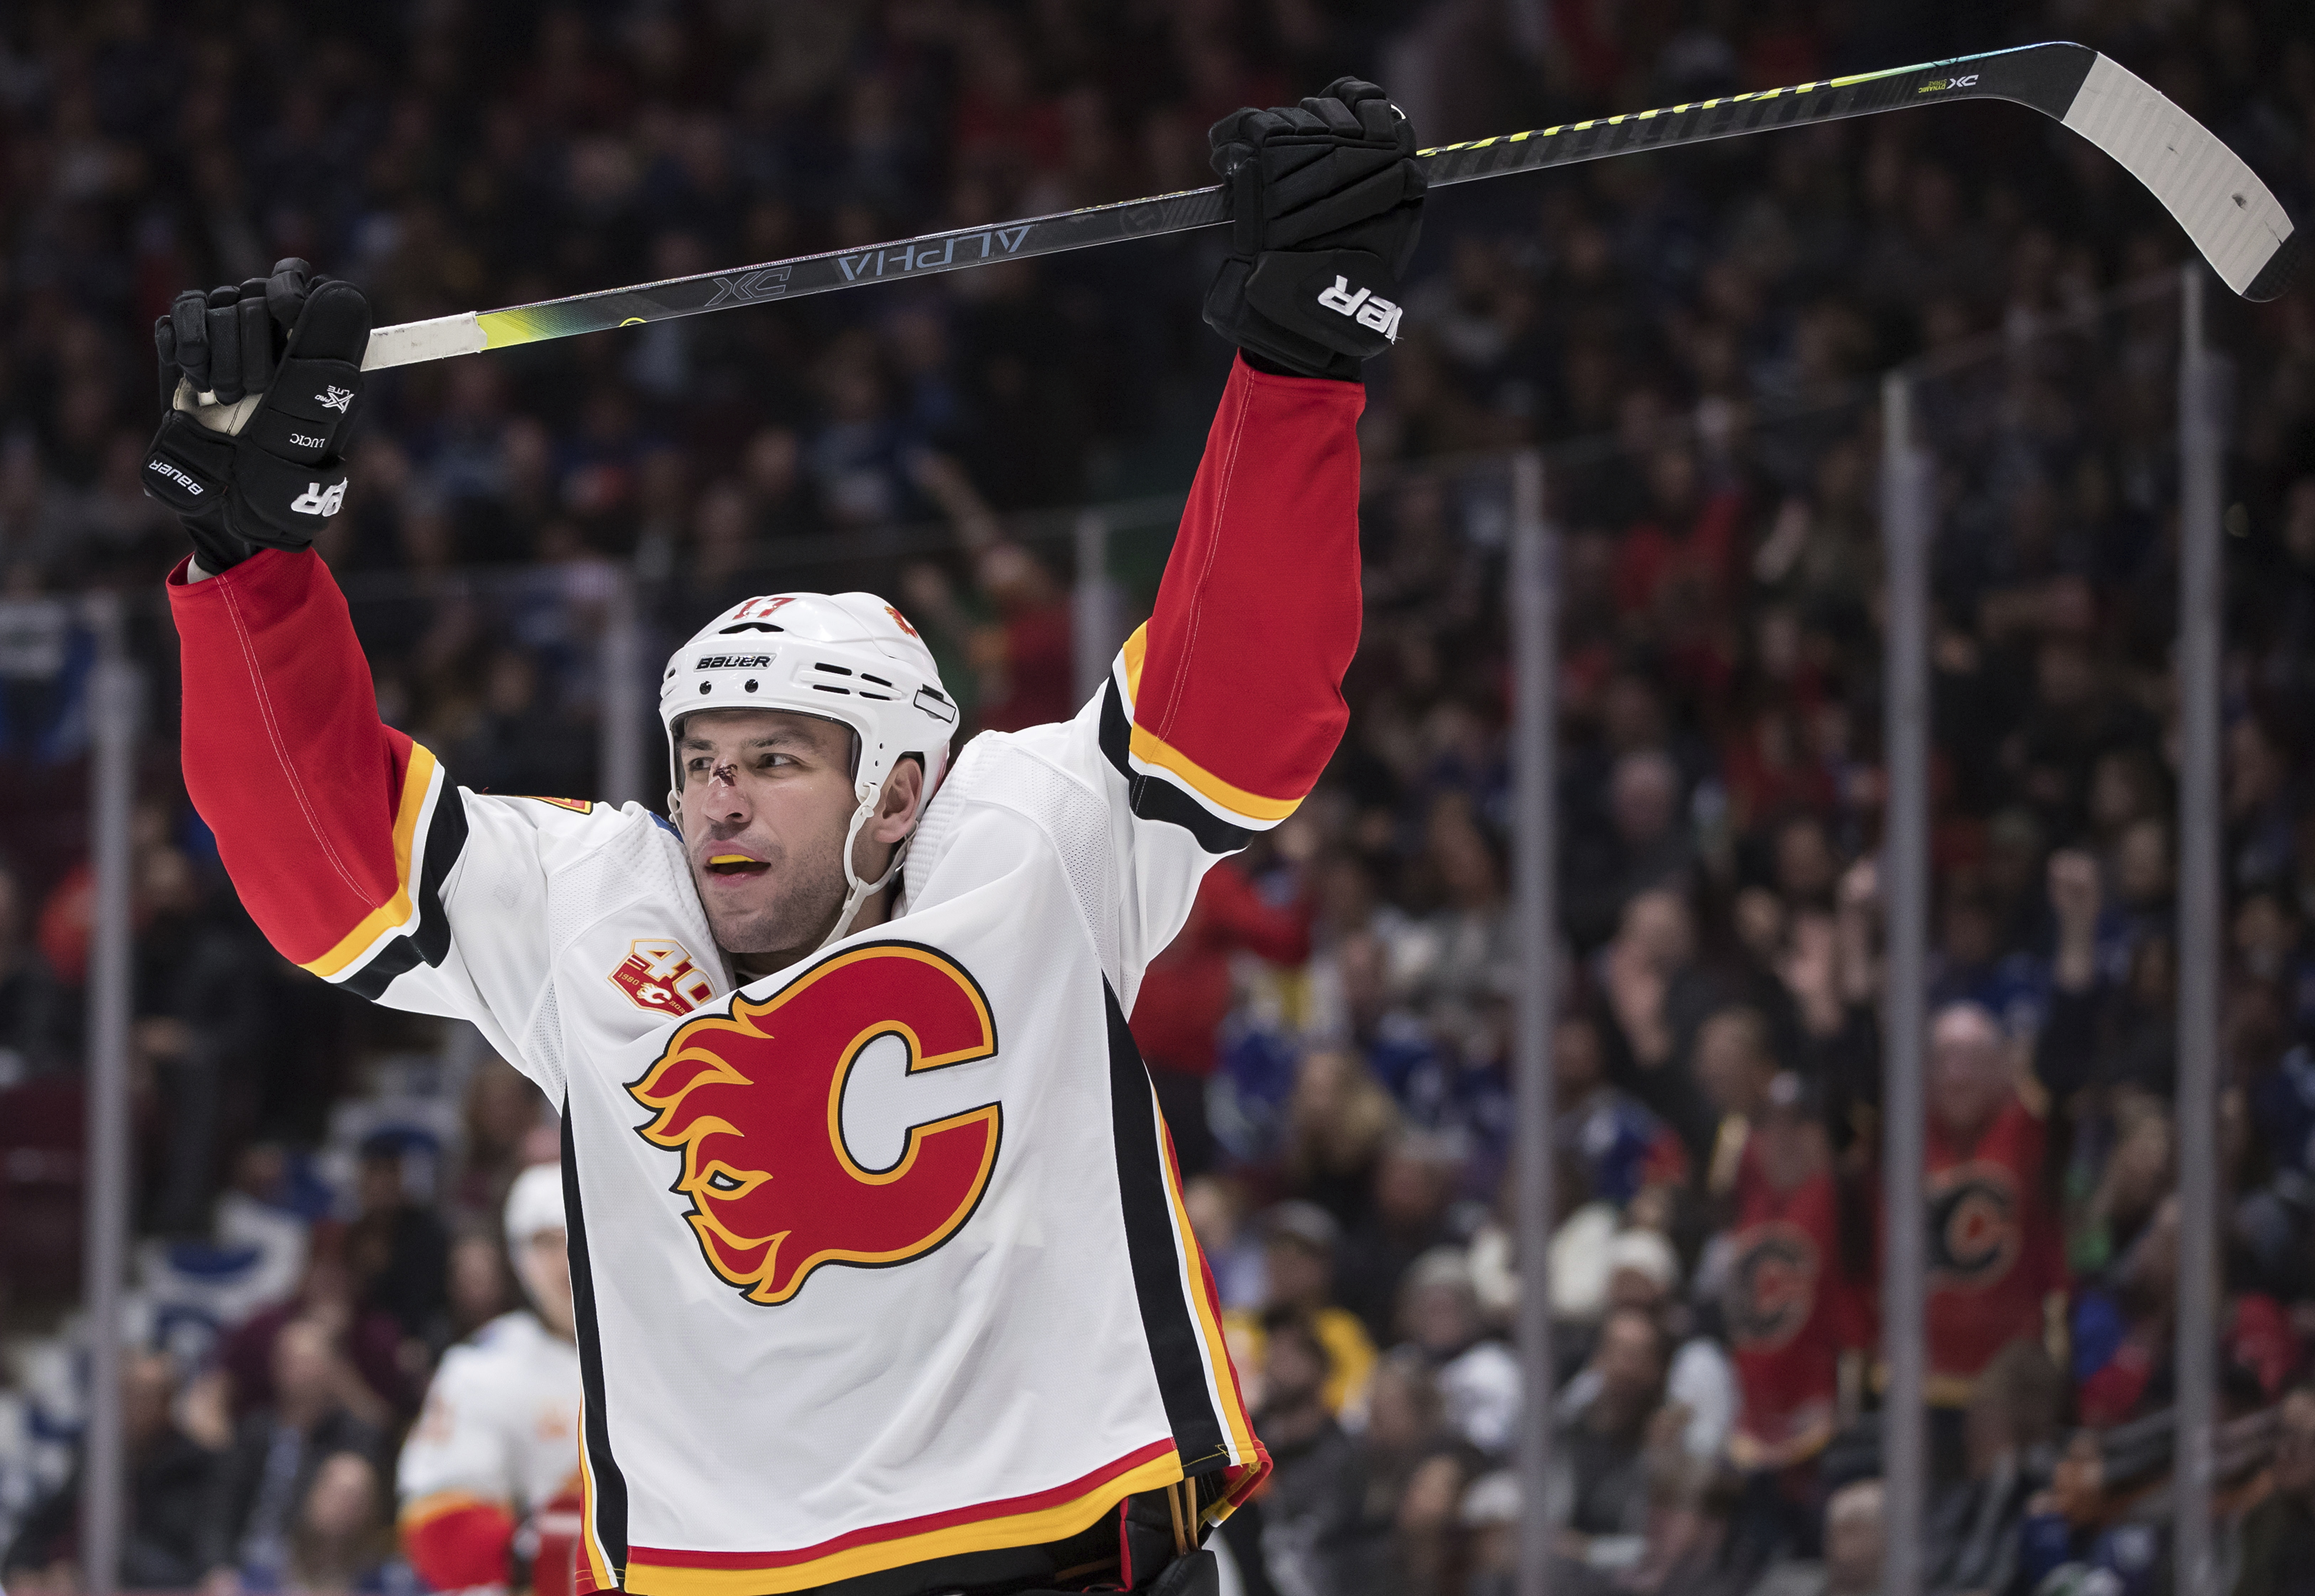 Dube has goal, 2 assists as Flames beat Canucks 6-2